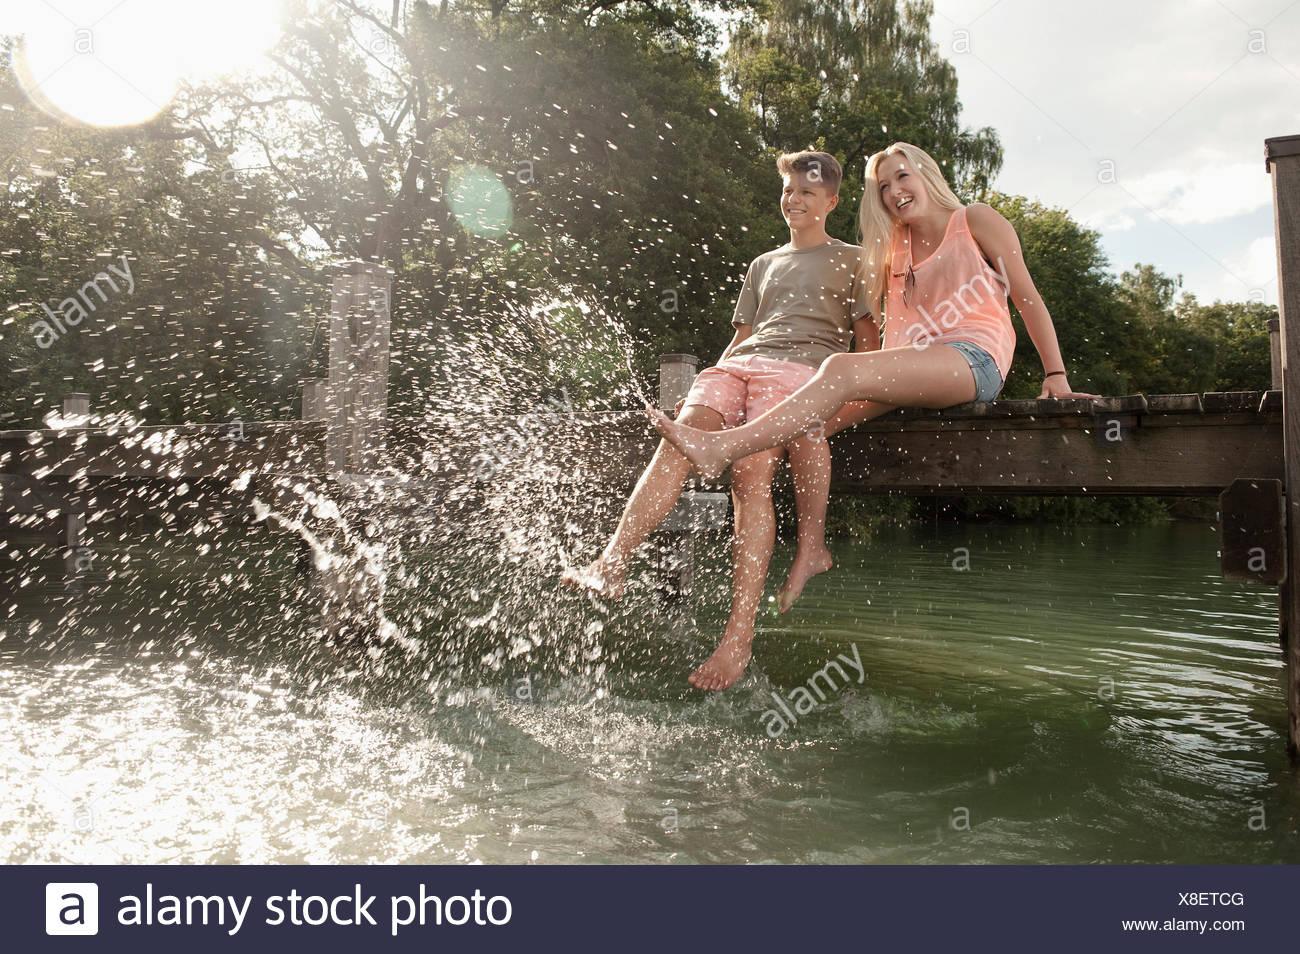 Teenage couple sitting on a jetty splashing water - Stock Image